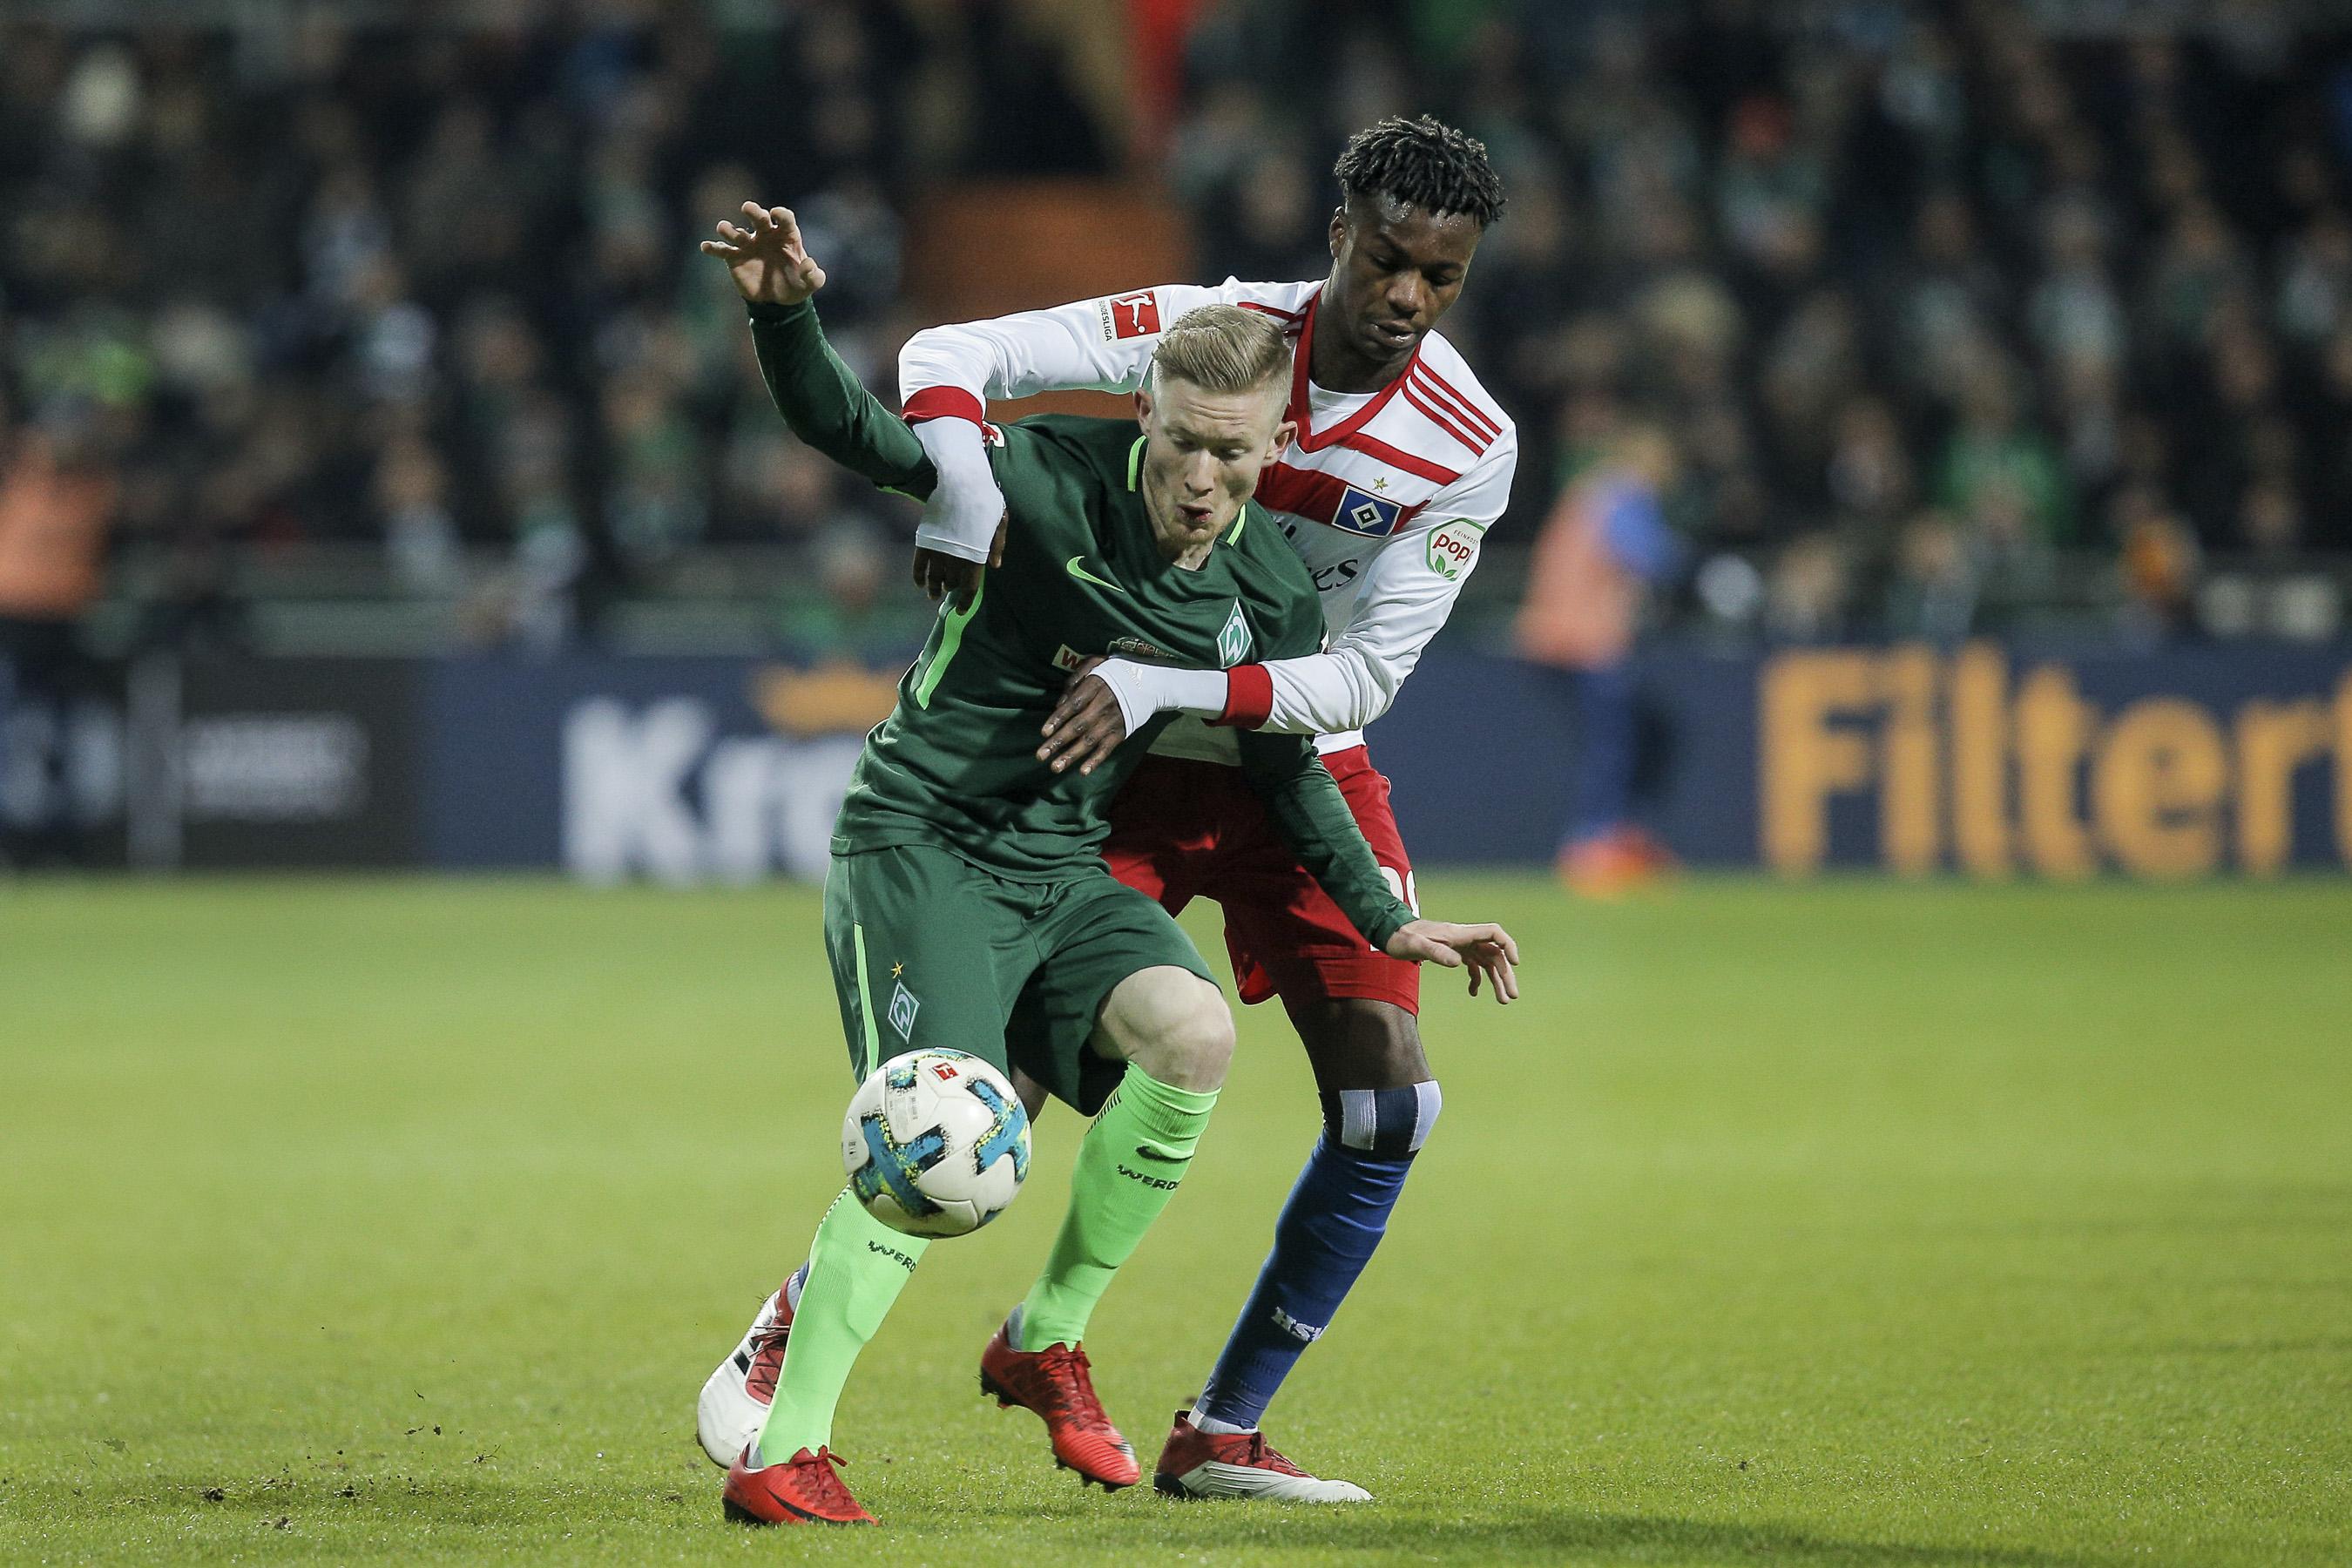 Florian Kainz ( Bremen ) im Zweikampf gegen Gideon Jung ( HSV ).